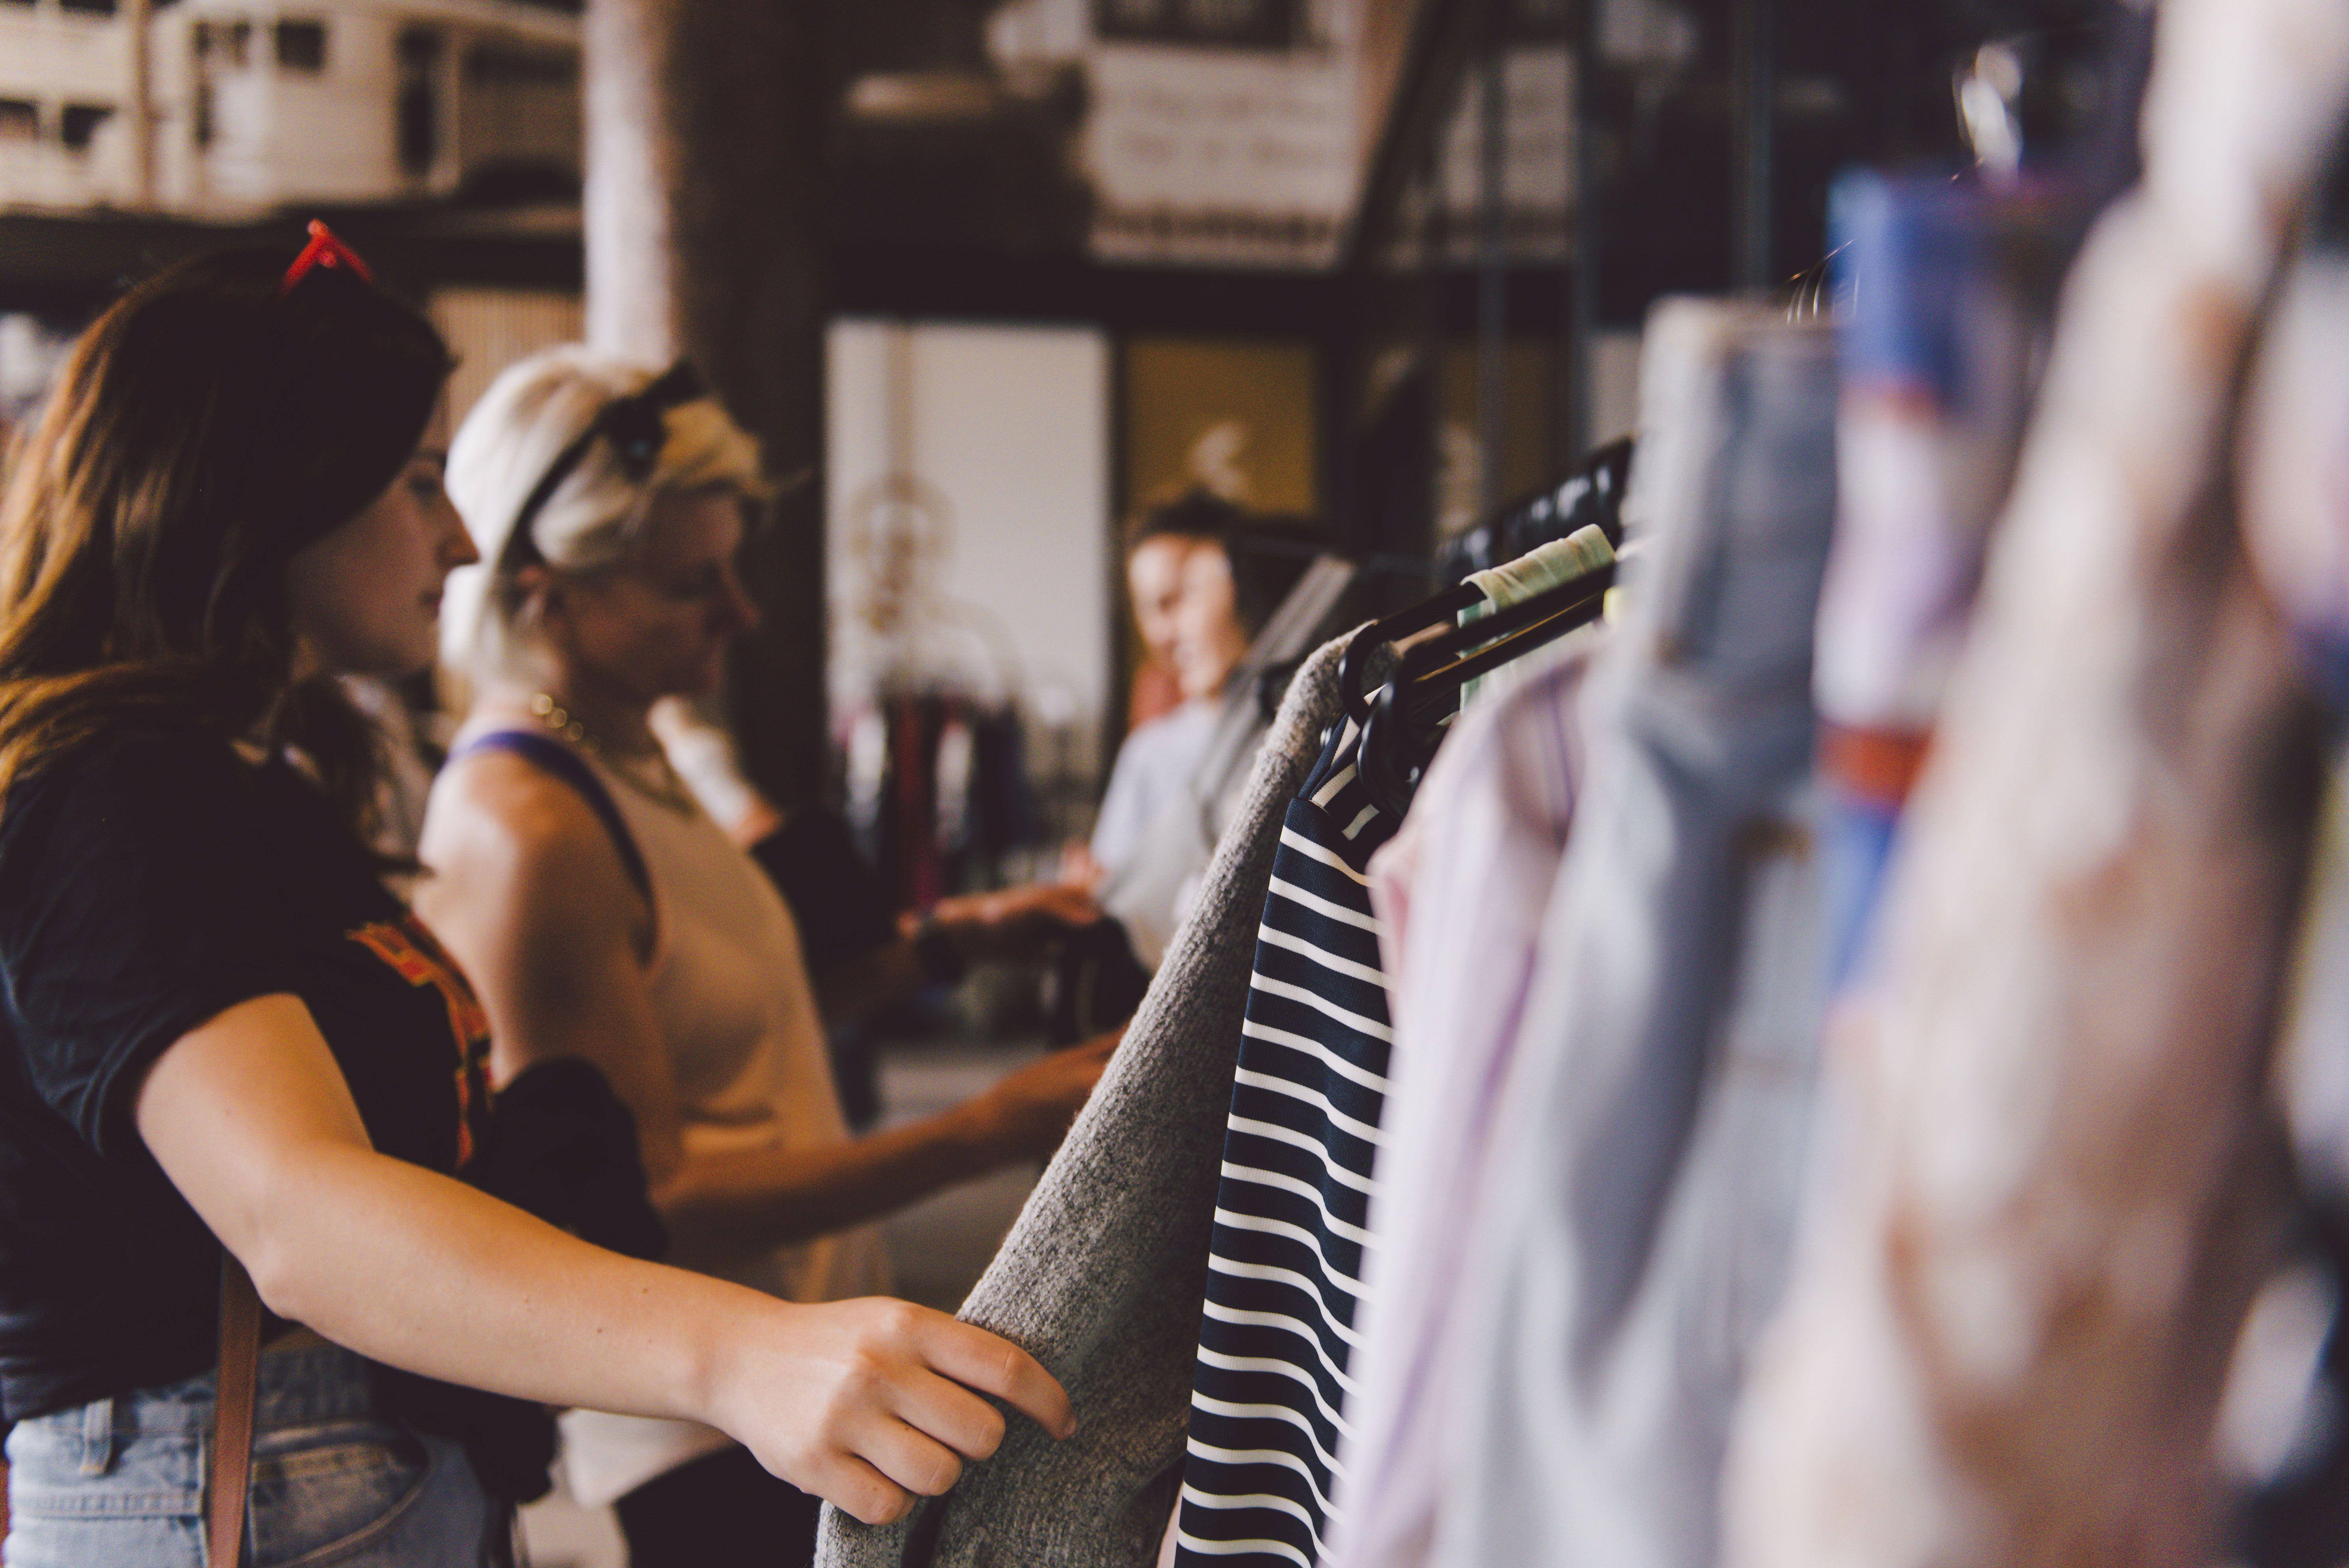 The Market Folk Pre Worn Rack Sale In 2020 Vintage Outfits Brisbane Marketing